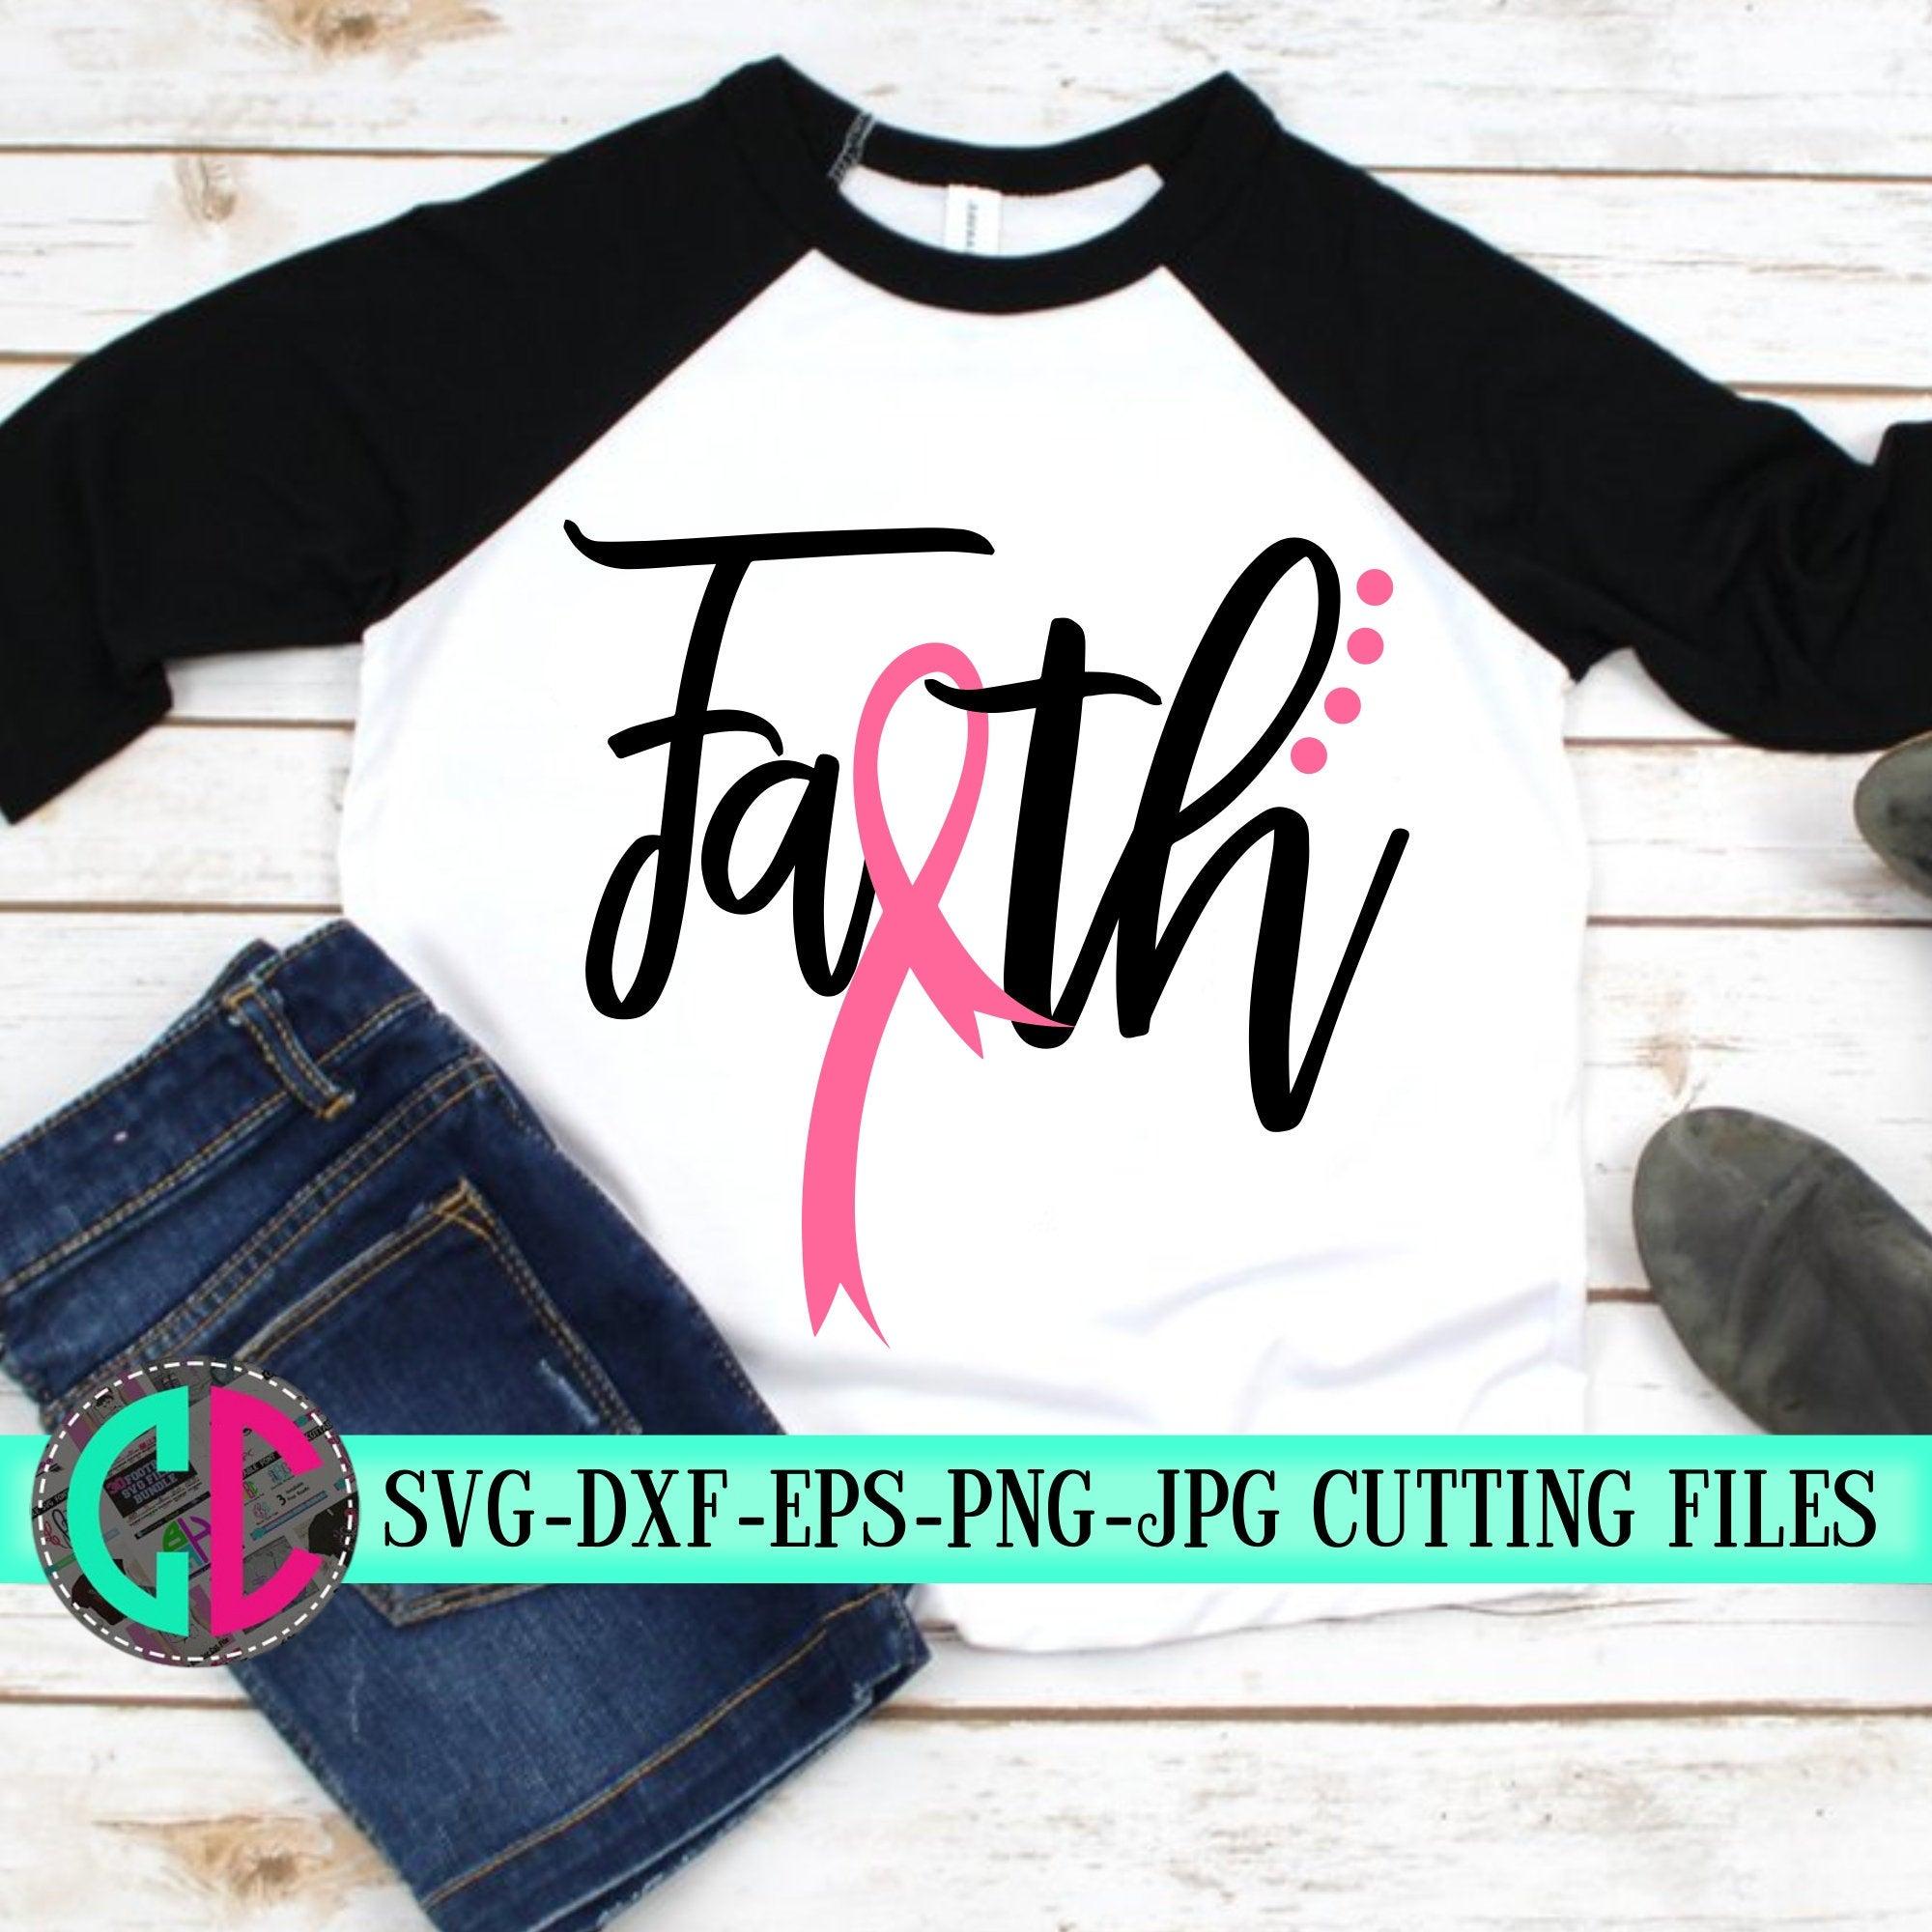 Faith-ribbon-svgbreast-cancer-svgcancer-survivor-svgpinkrelay-for-life-svgbreast-cancersilhouettetshirt-svgcameosvg-for-cricut-5e2203e4